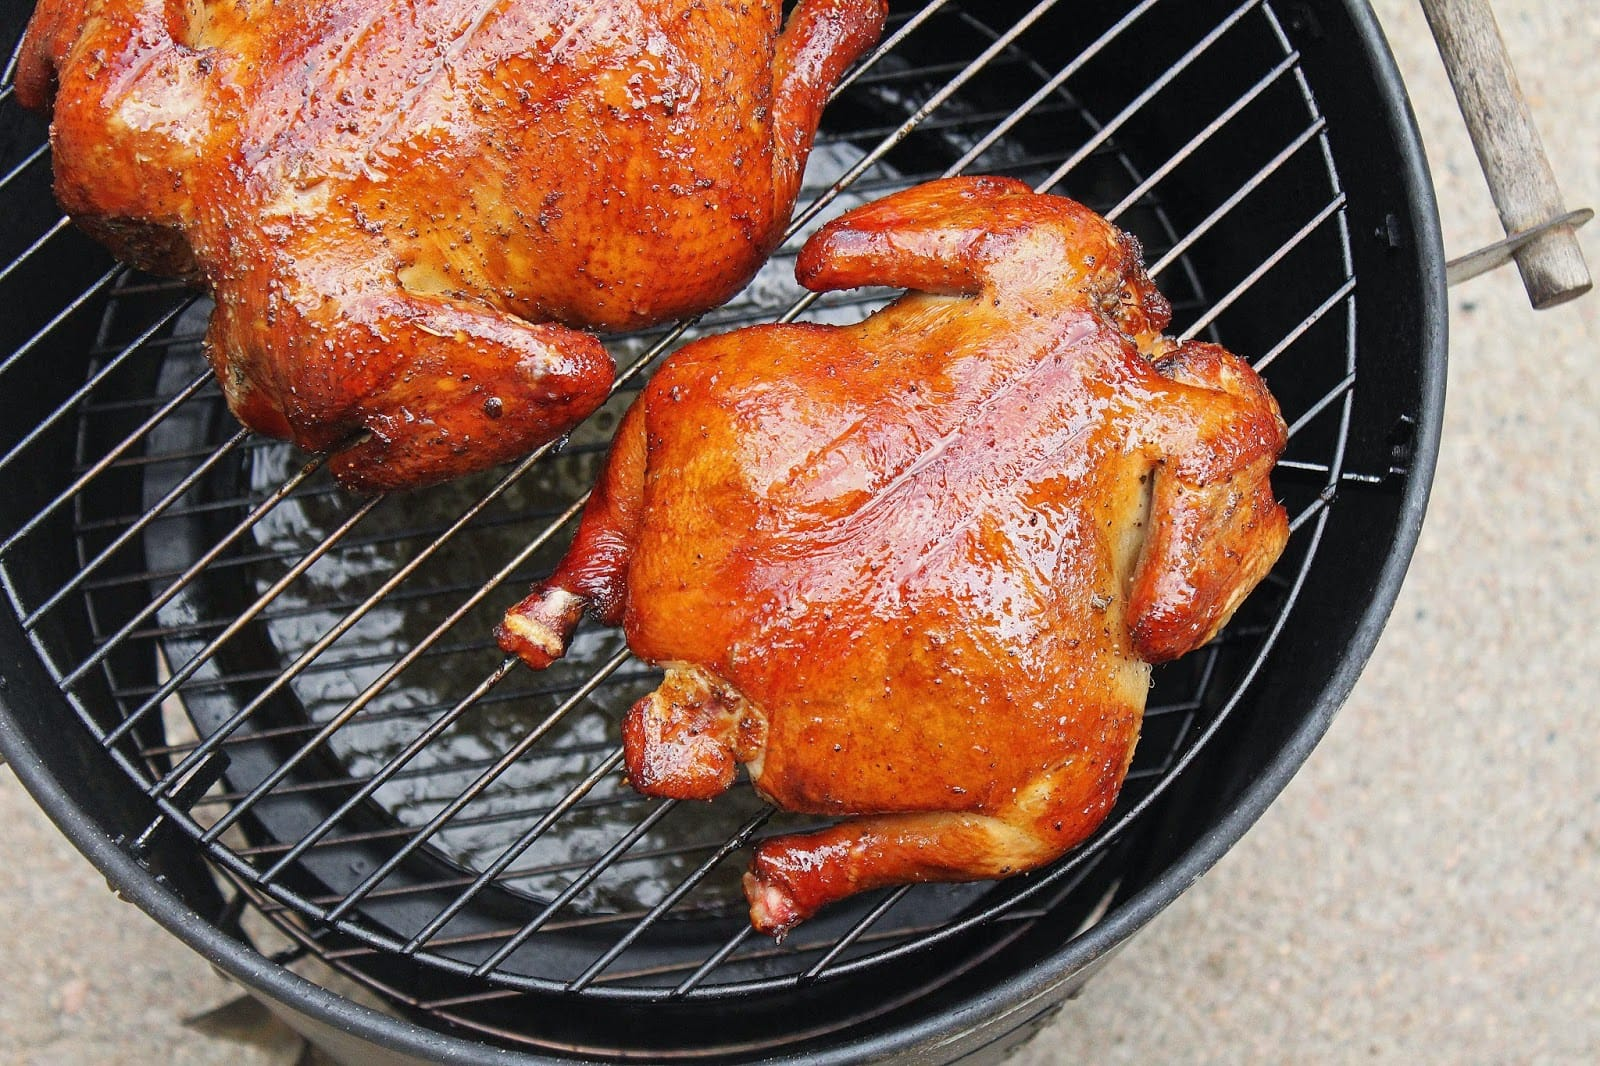 Засолка мяса в домашних условиях: рецепты